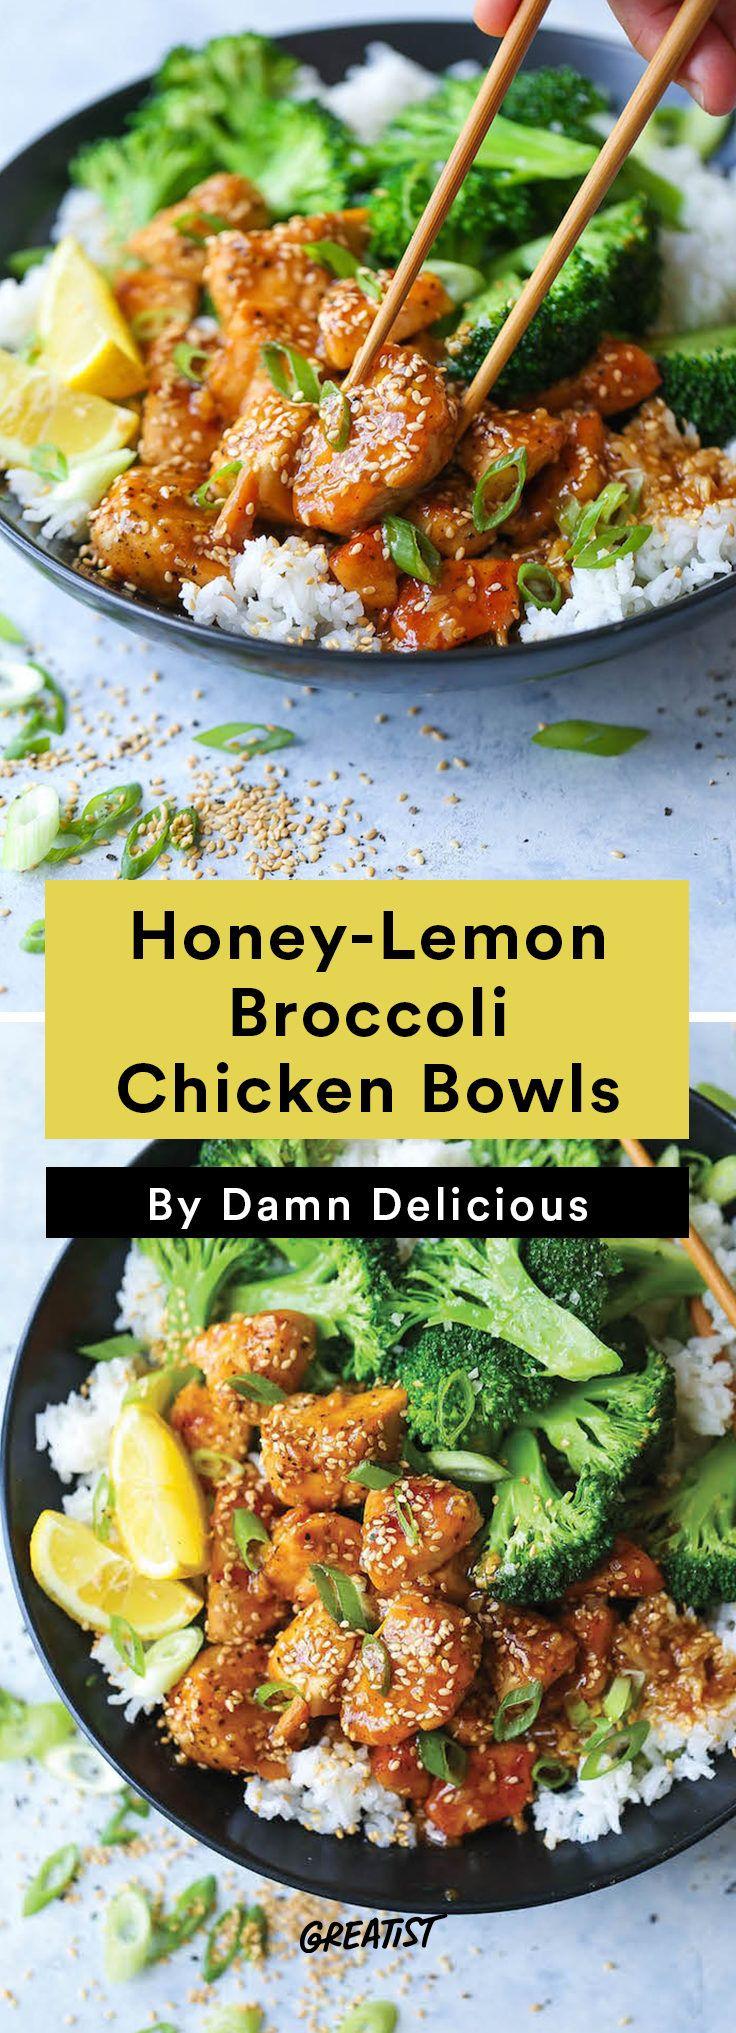 1. Honey-Lemon Chicken Broccoli Bowls #easy #dinner #recipes http://greatist.com/eat/easy-dinner-recipes-to-make-this-week